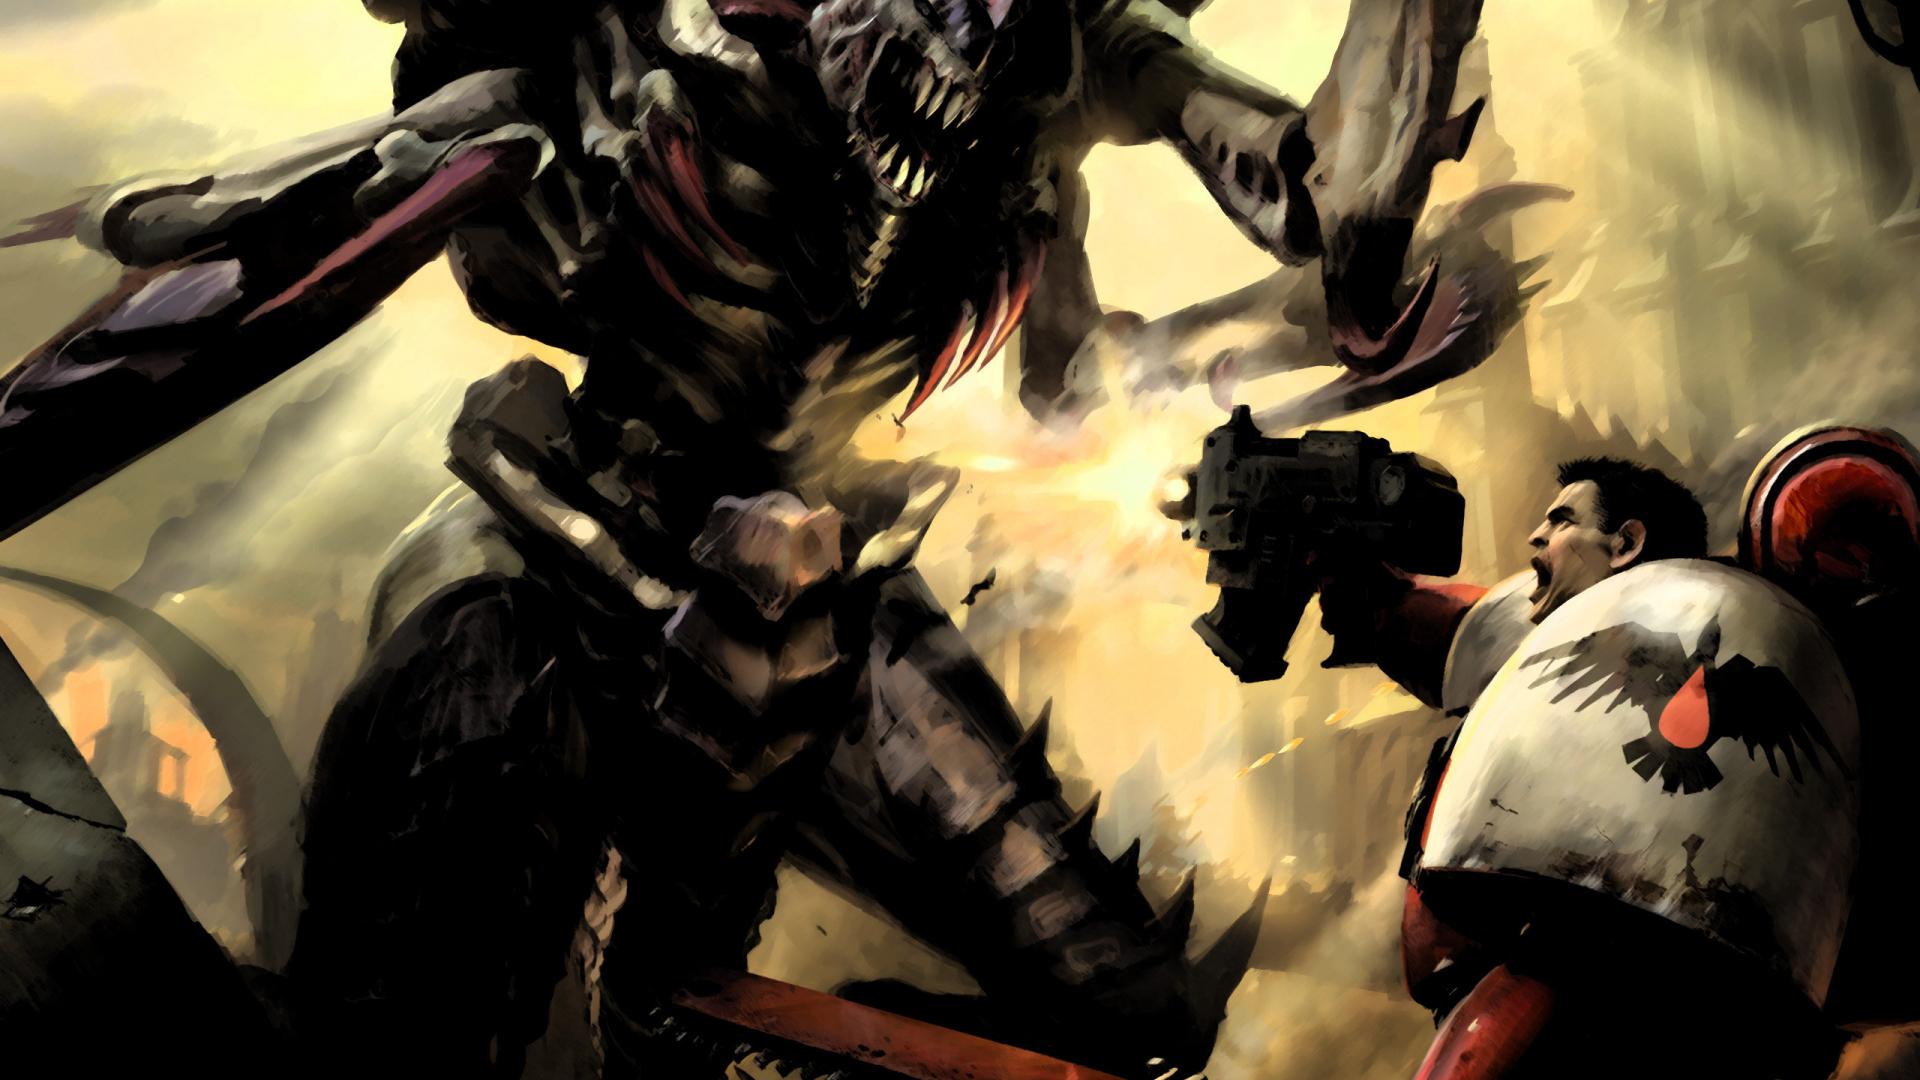 Free Download Warhammer 40k Black Templar Wallpaper 2560x1600 1550